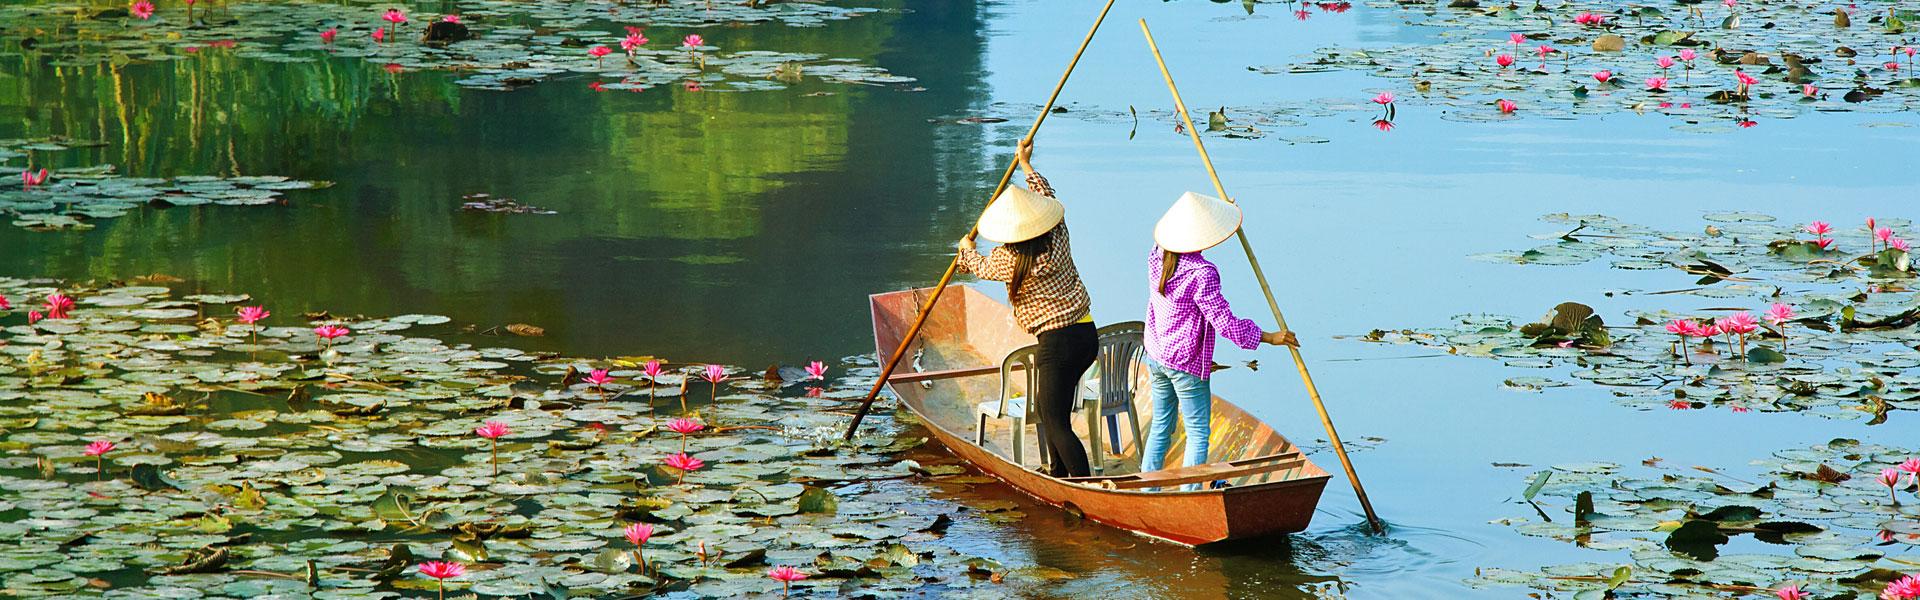 5 Reasons to Visit Vietnam in 2017 | Wendy Wu Tours Blog